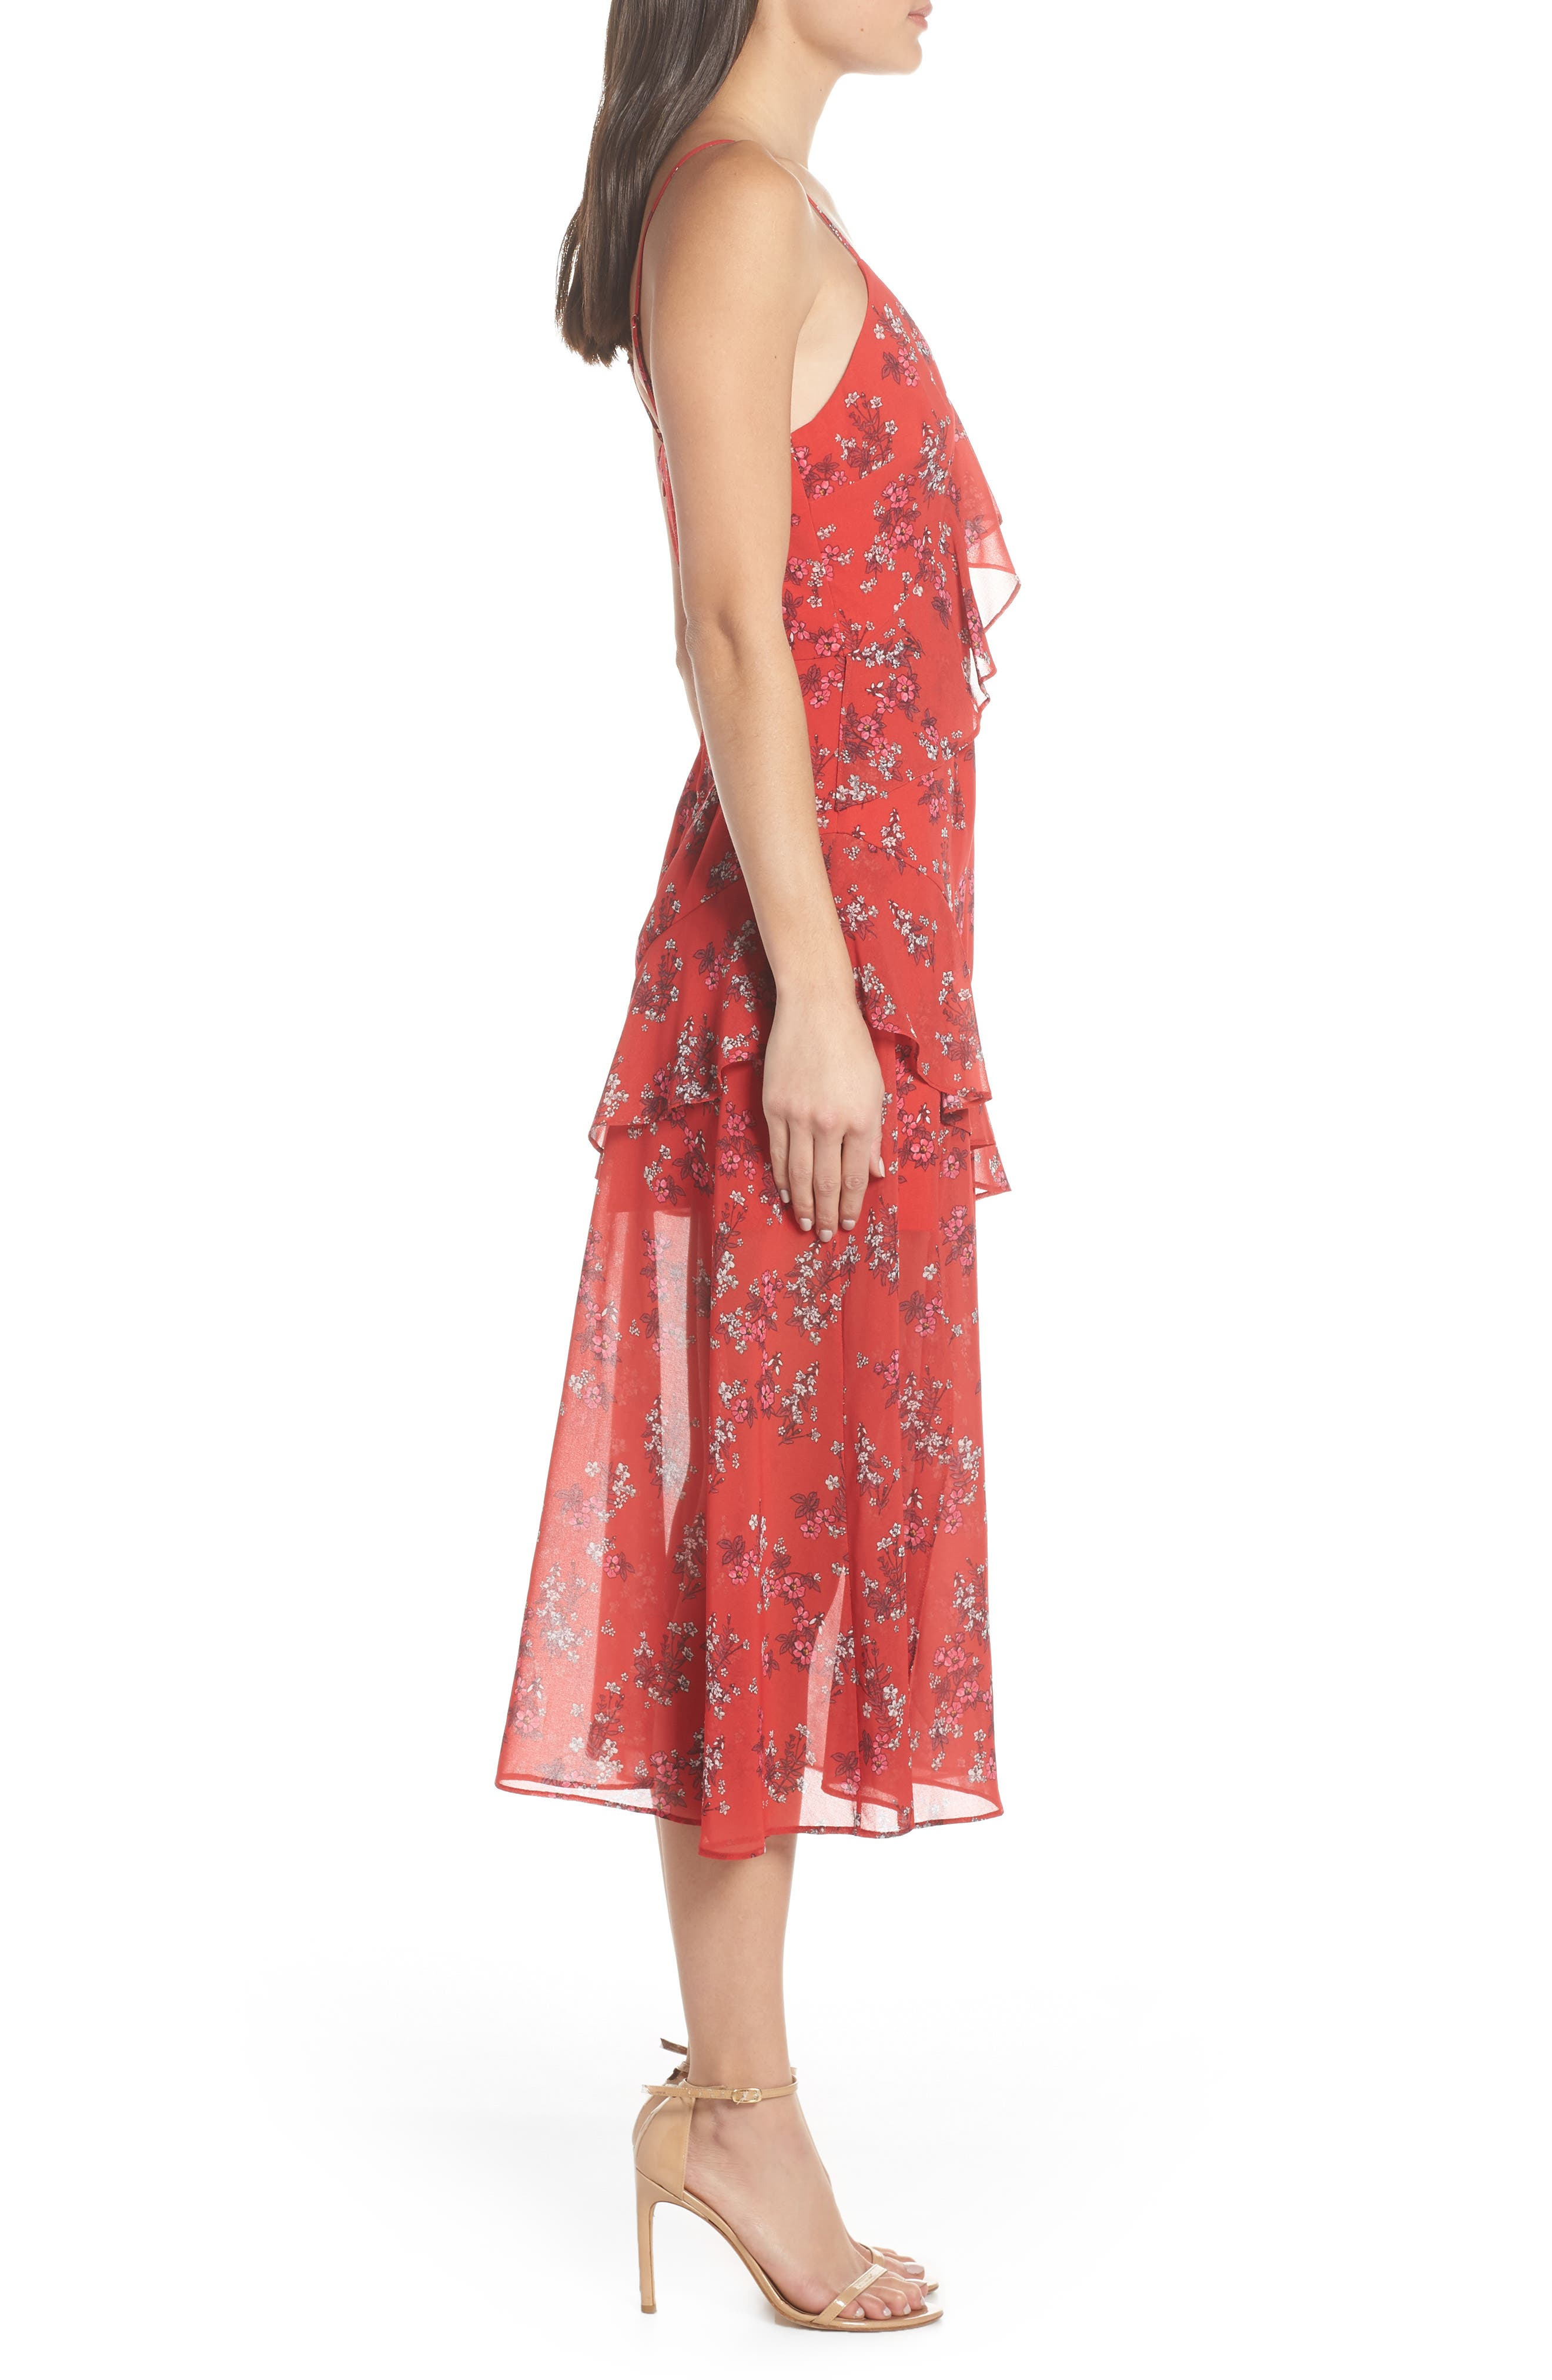 KEEPSAKE THE LABEL,                             Heart & Soul Ruffle Detail Tea Length Dress,                             Alternate thumbnail 3, color,                             SMALL RED FLORAL